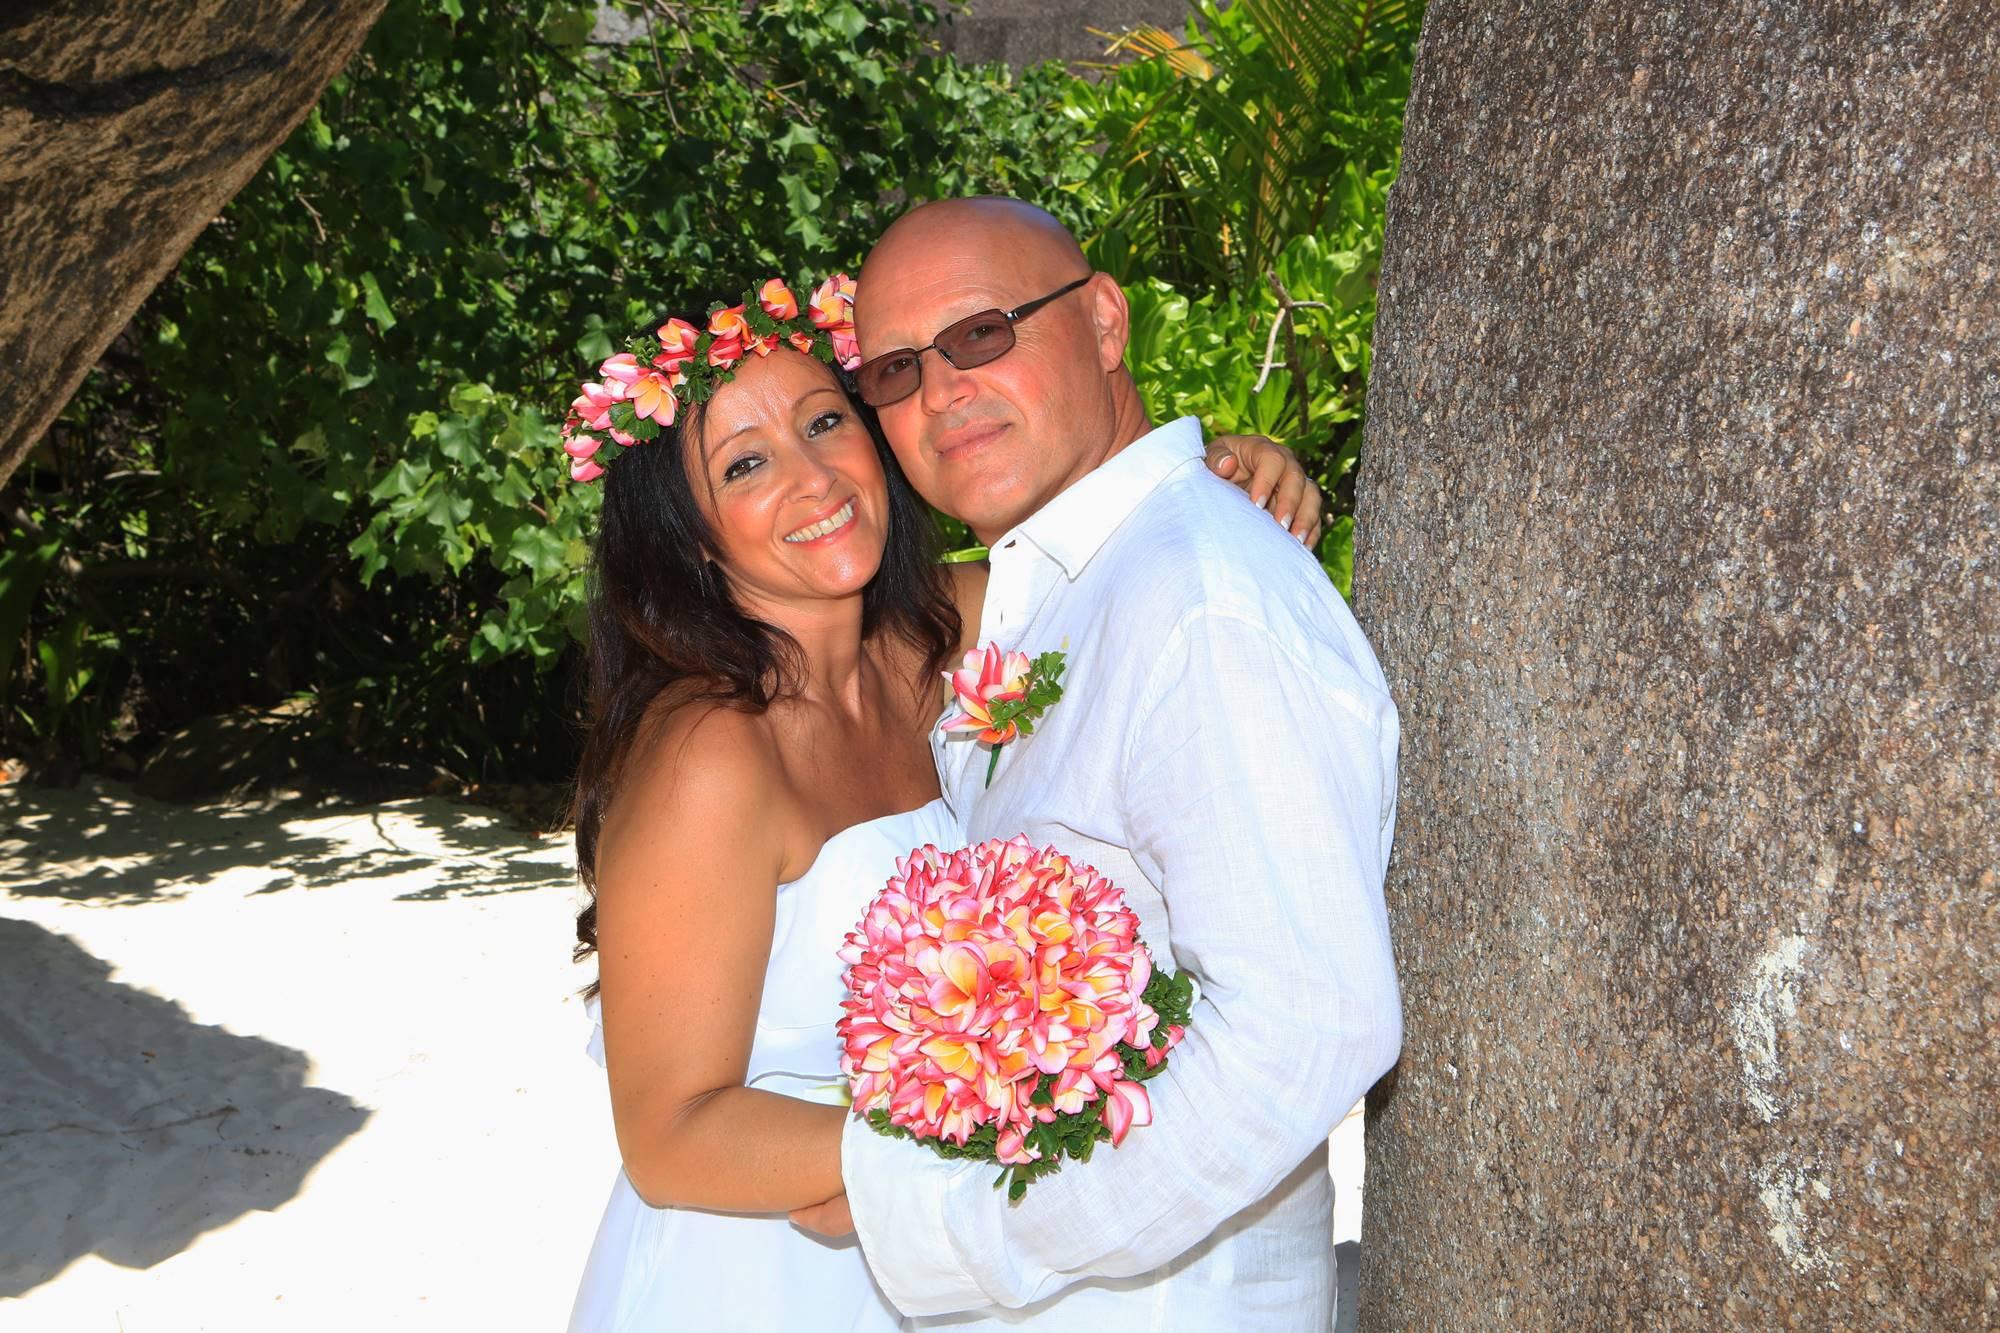 Matrimonio Simbolico Alle Seychelles : Foto matrimonio alle seychelles di rosa e maurizio